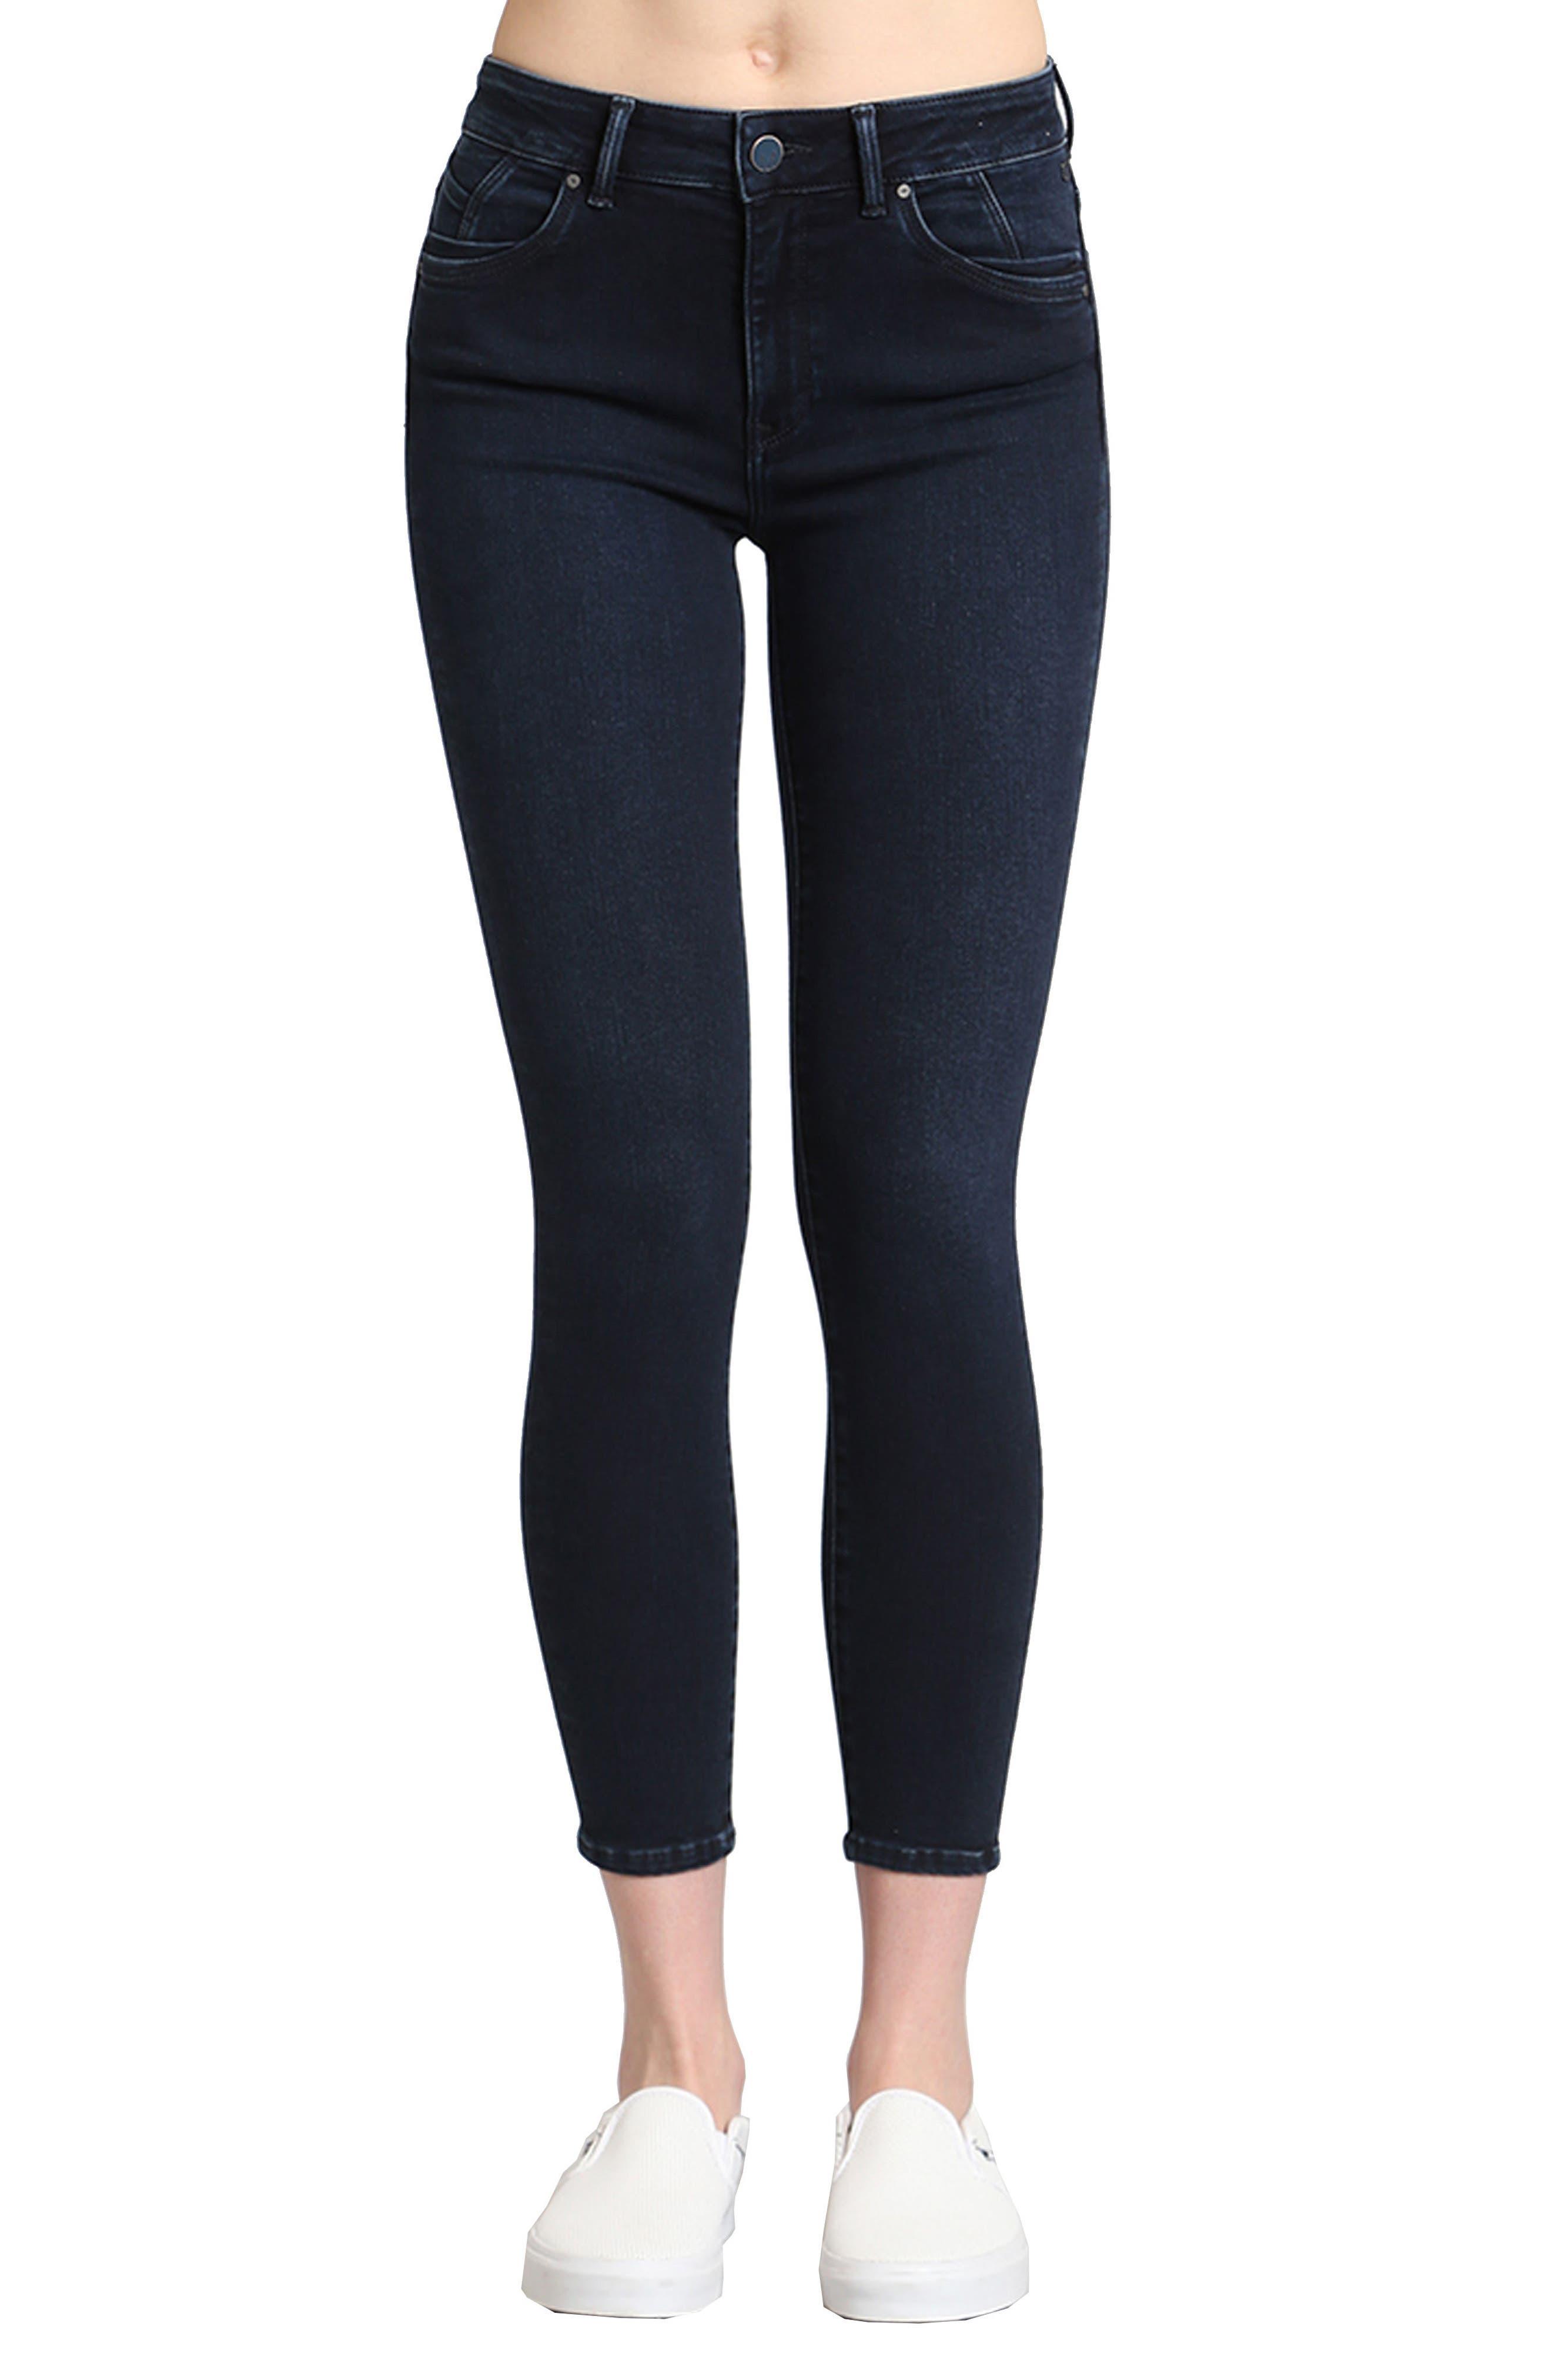 Main Image - Mavi Jeans Tess Stretch Ankle Skinny Jeans (Ink Brushed Indigo Move)